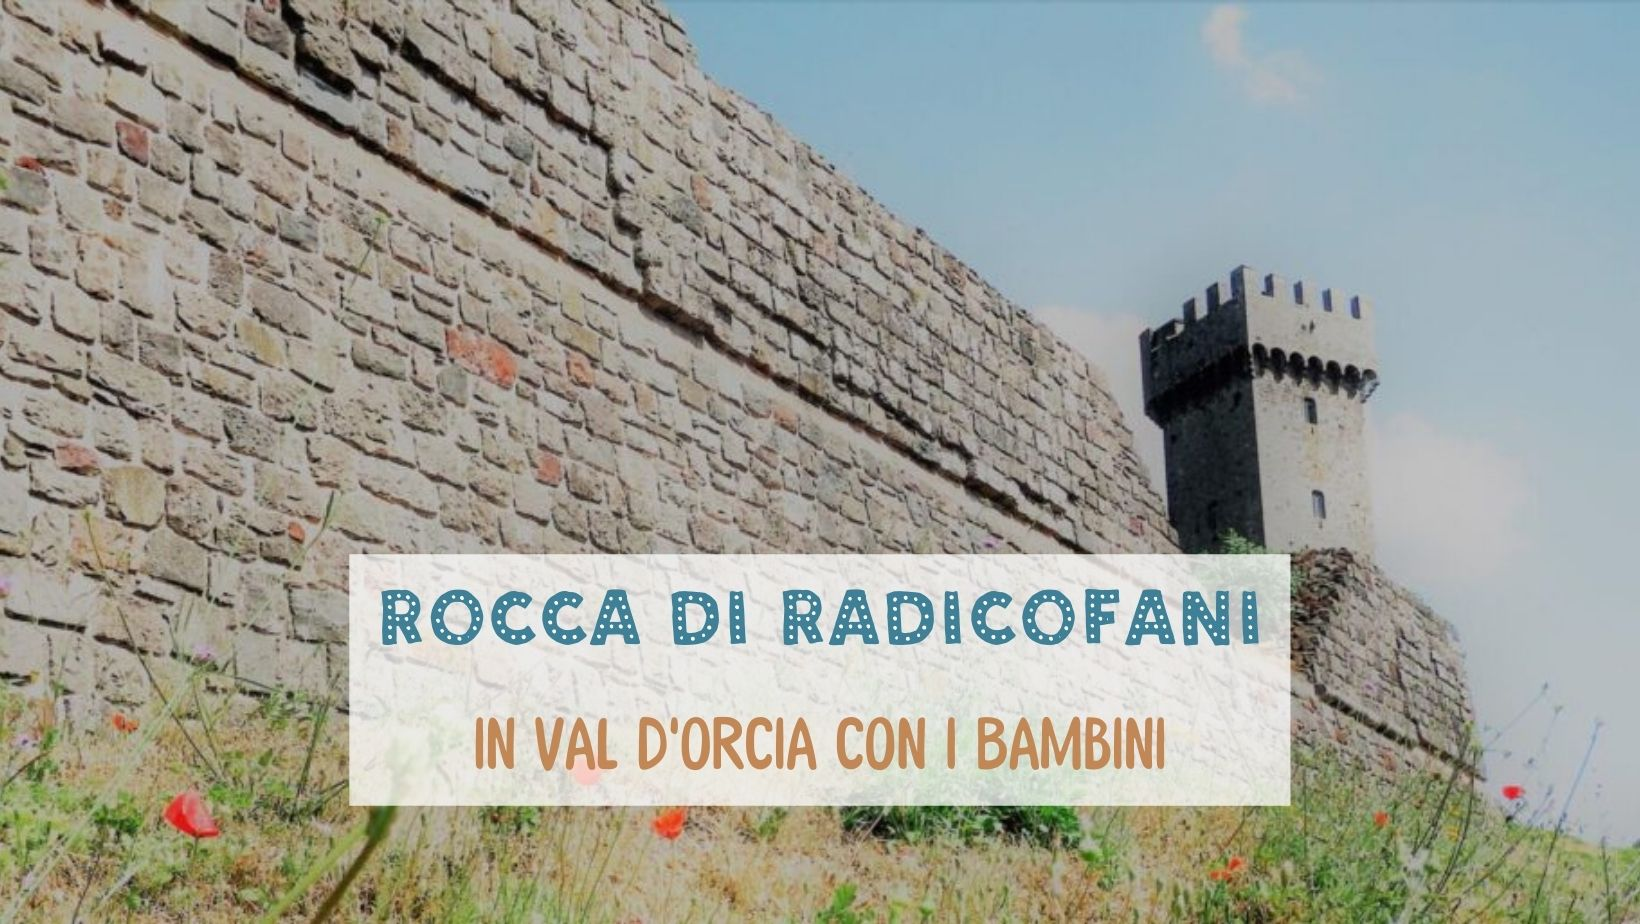 Toscana Val d'Orcia Radicofani bambini (2)